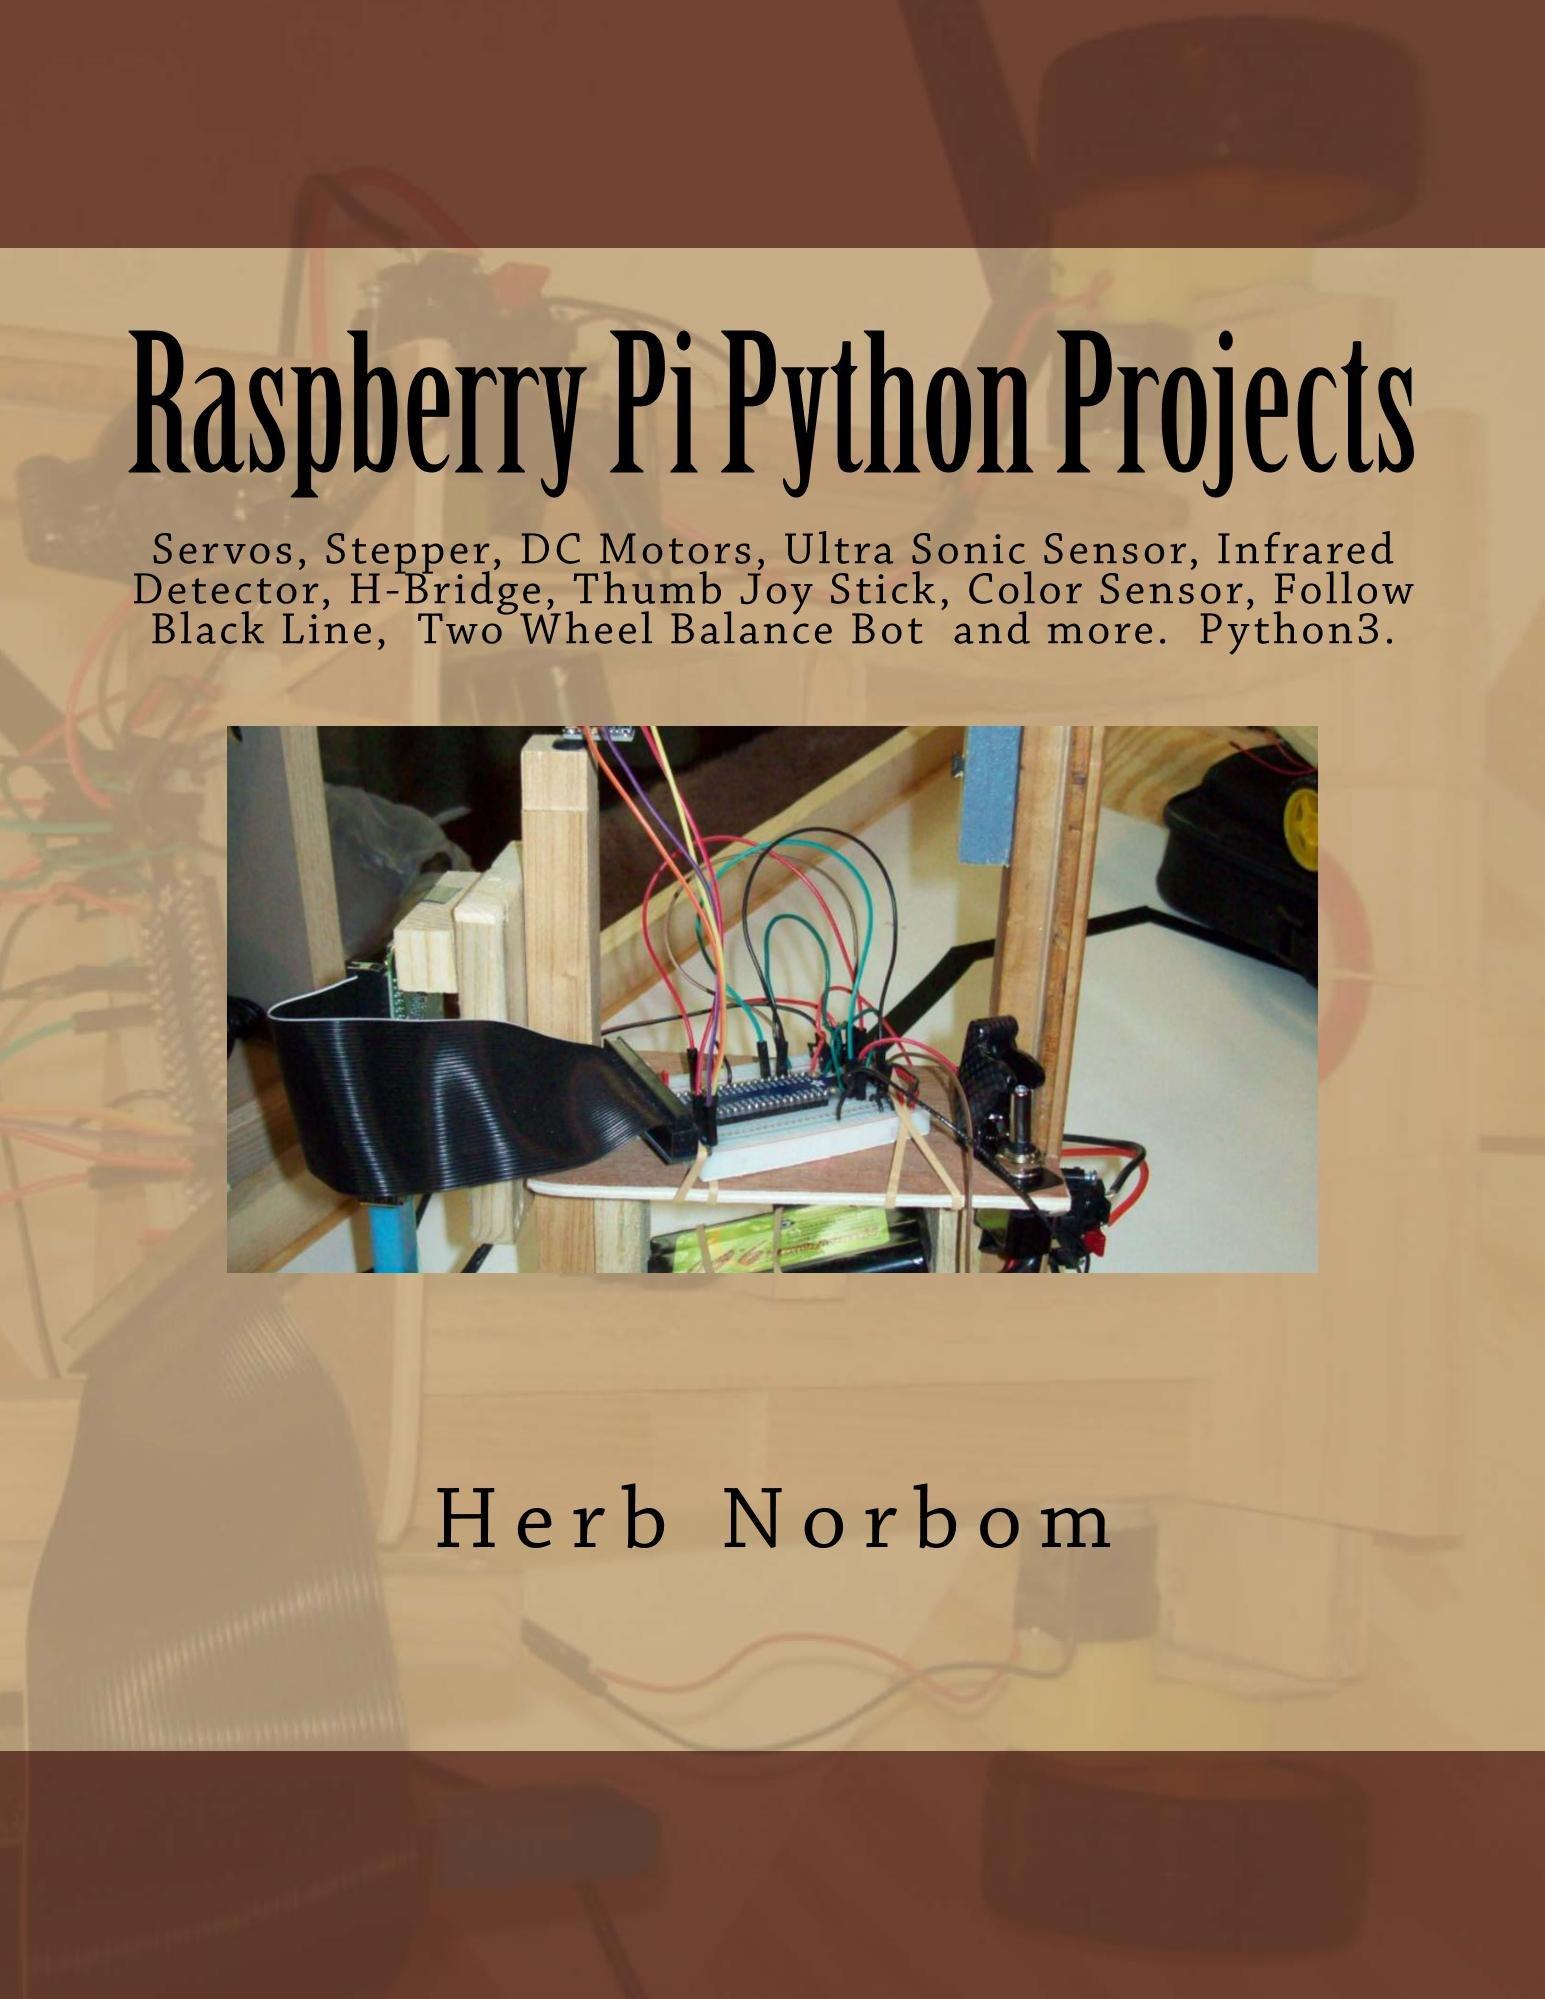 Raspberry Pi Python Projects  Pyhton3 Tkinter Ttk ClockTemperature Tactile Ultra Sonic And Color Sensor Servo Stepper DC Motor Infrared Detector ... Stick Two Wheel Balance  English Edition